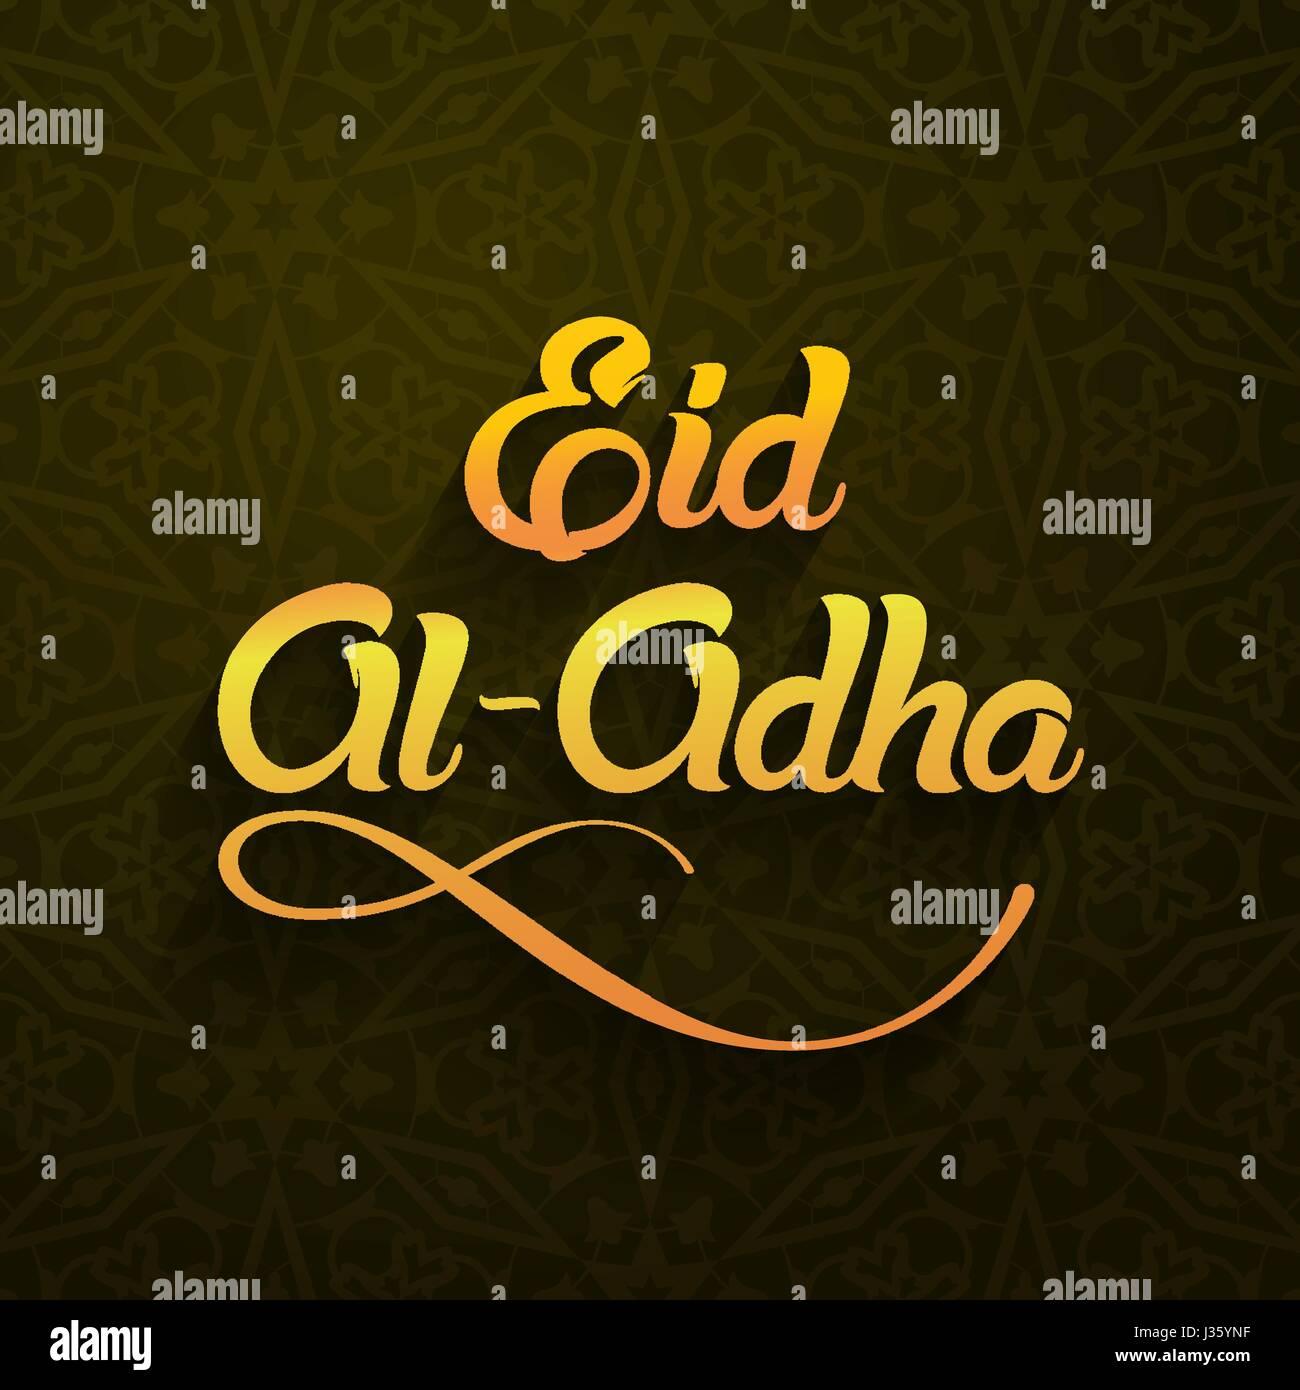 Eid Al Adha Eid Ul Adha Mubarak Kurban Bayrami Kurban Bajram